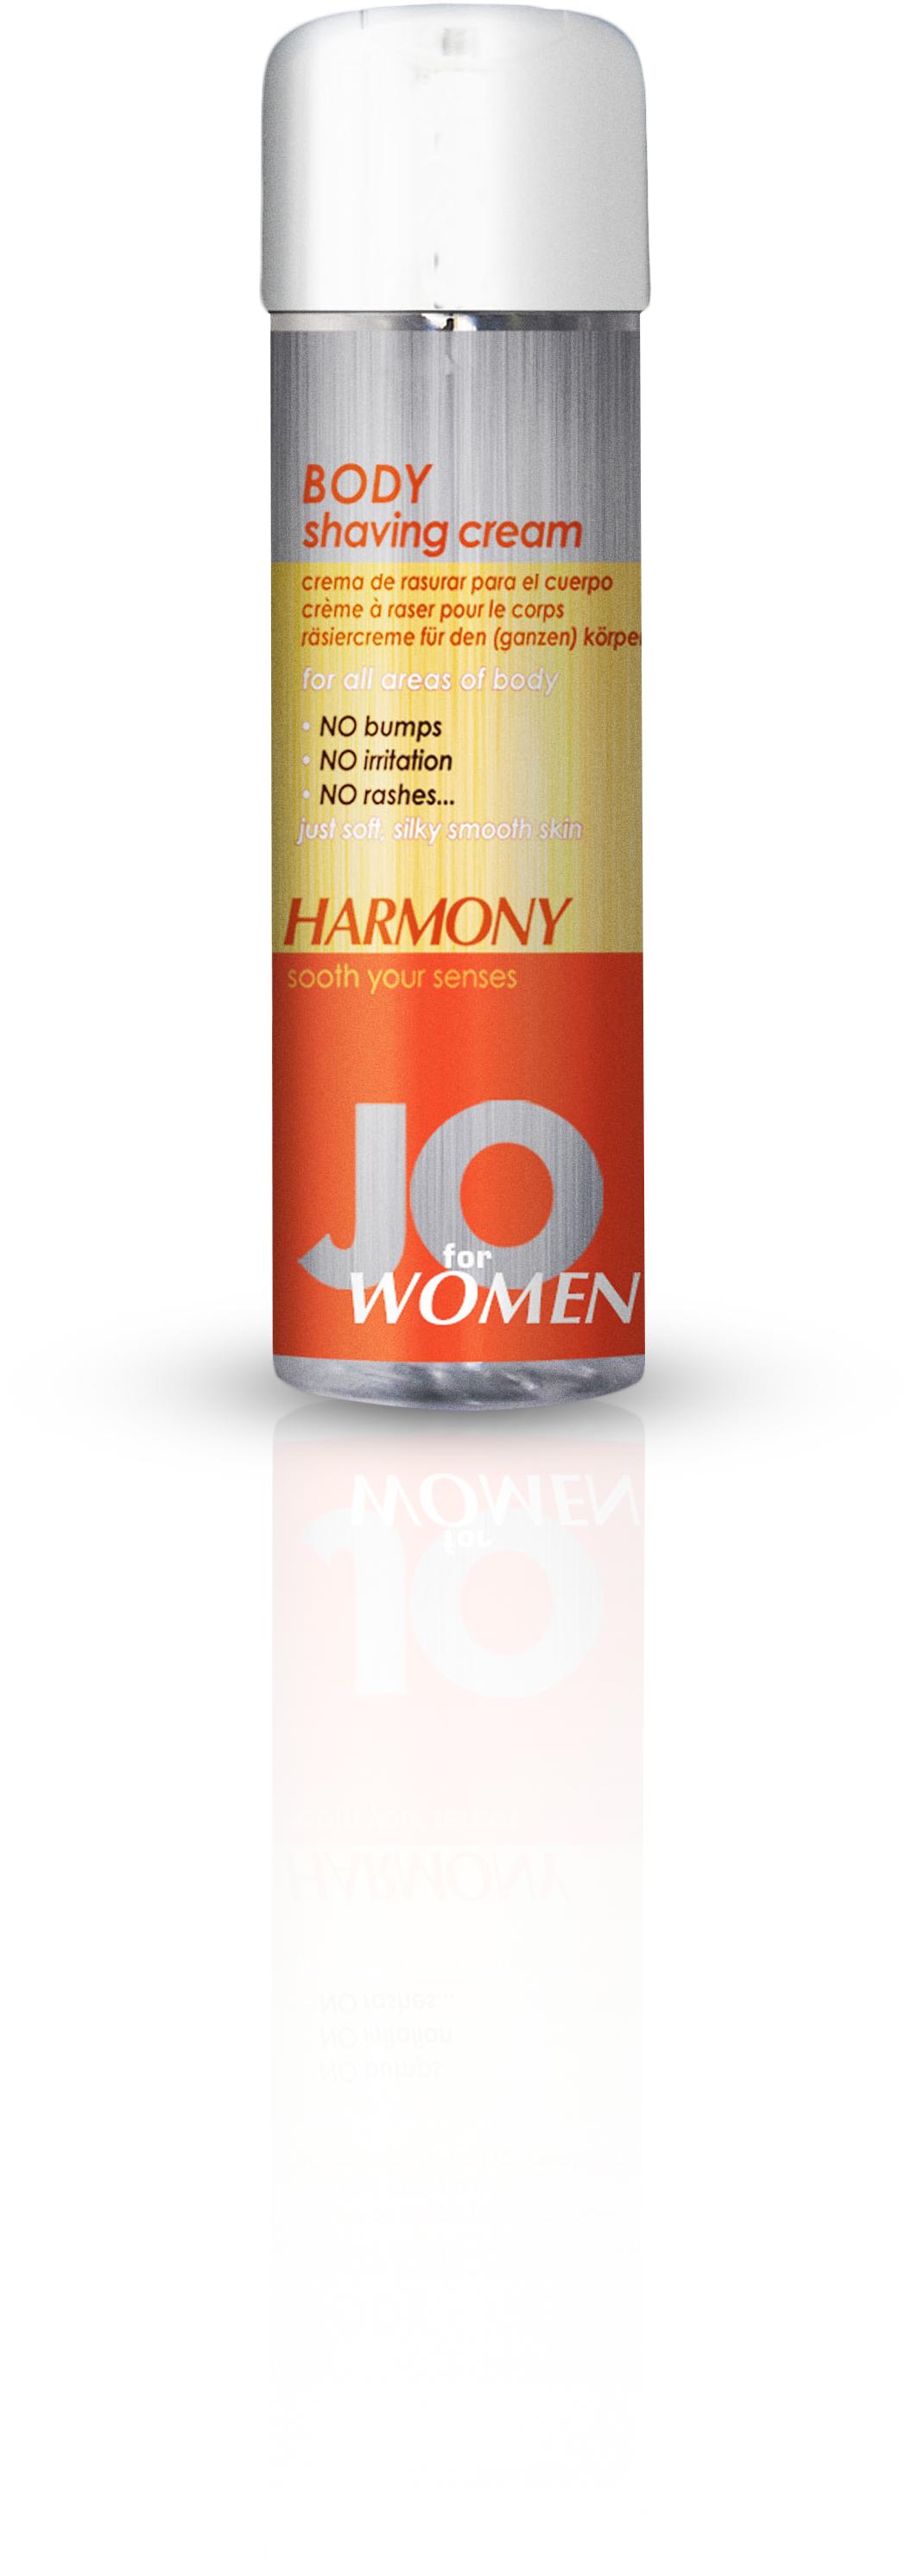 40183_JO_shavecream_women_harmony_8oz.jpg